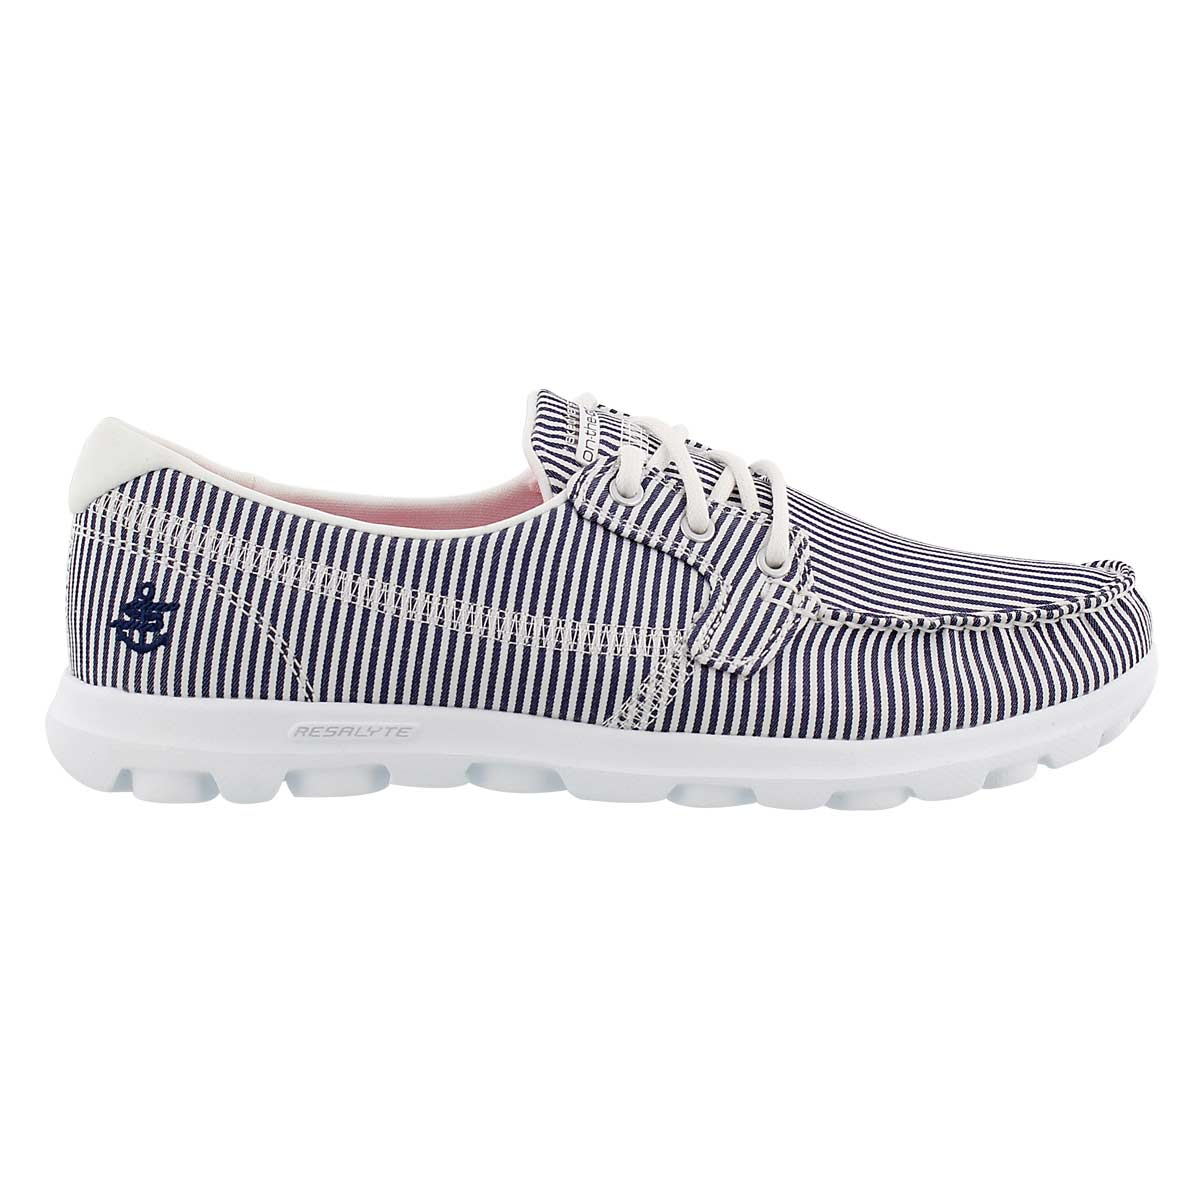 dfaad3720662 skechers go walk boat shoes sale   OFF64% Discounted